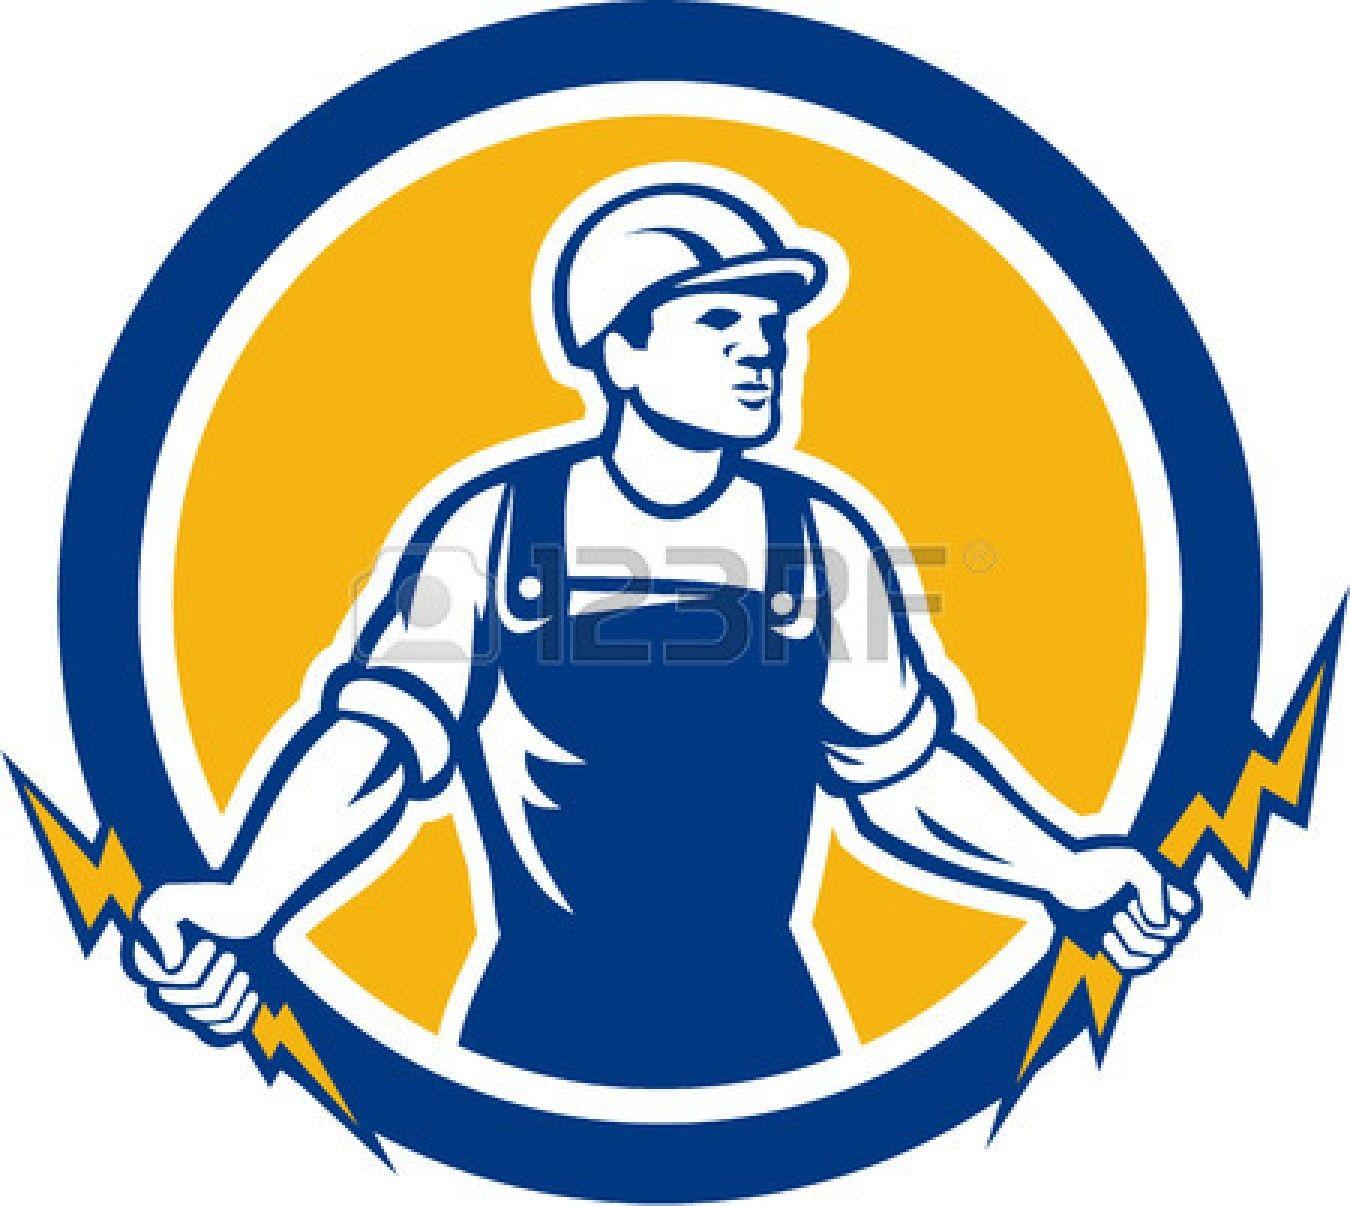 Vintage Lightning Logo Google Search Lightning Logo Retro Illustration Power Lineman